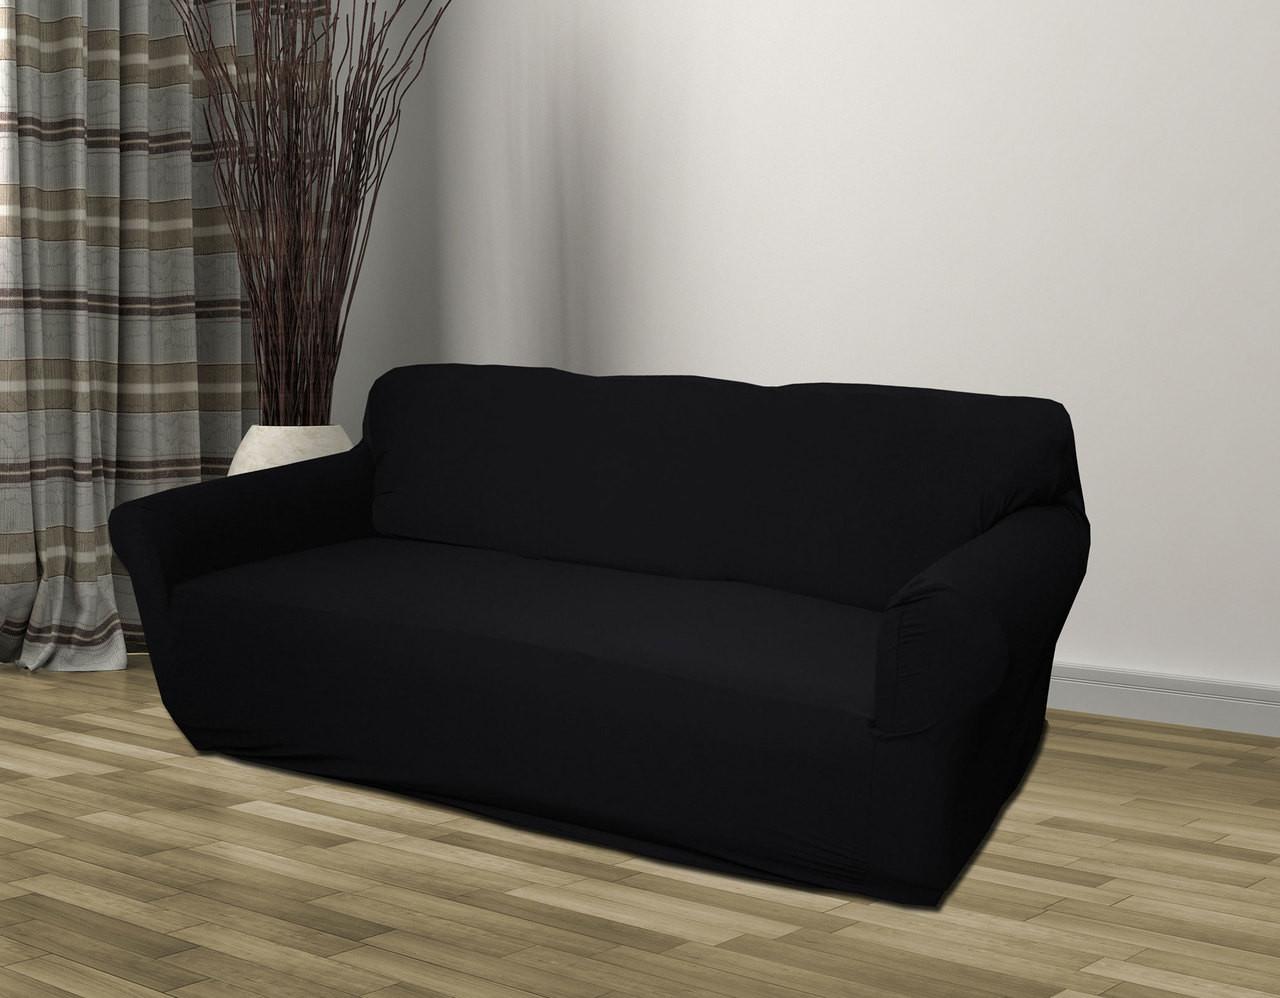 Kashi Home Stretch Jersey Sofa Slipcover - Black